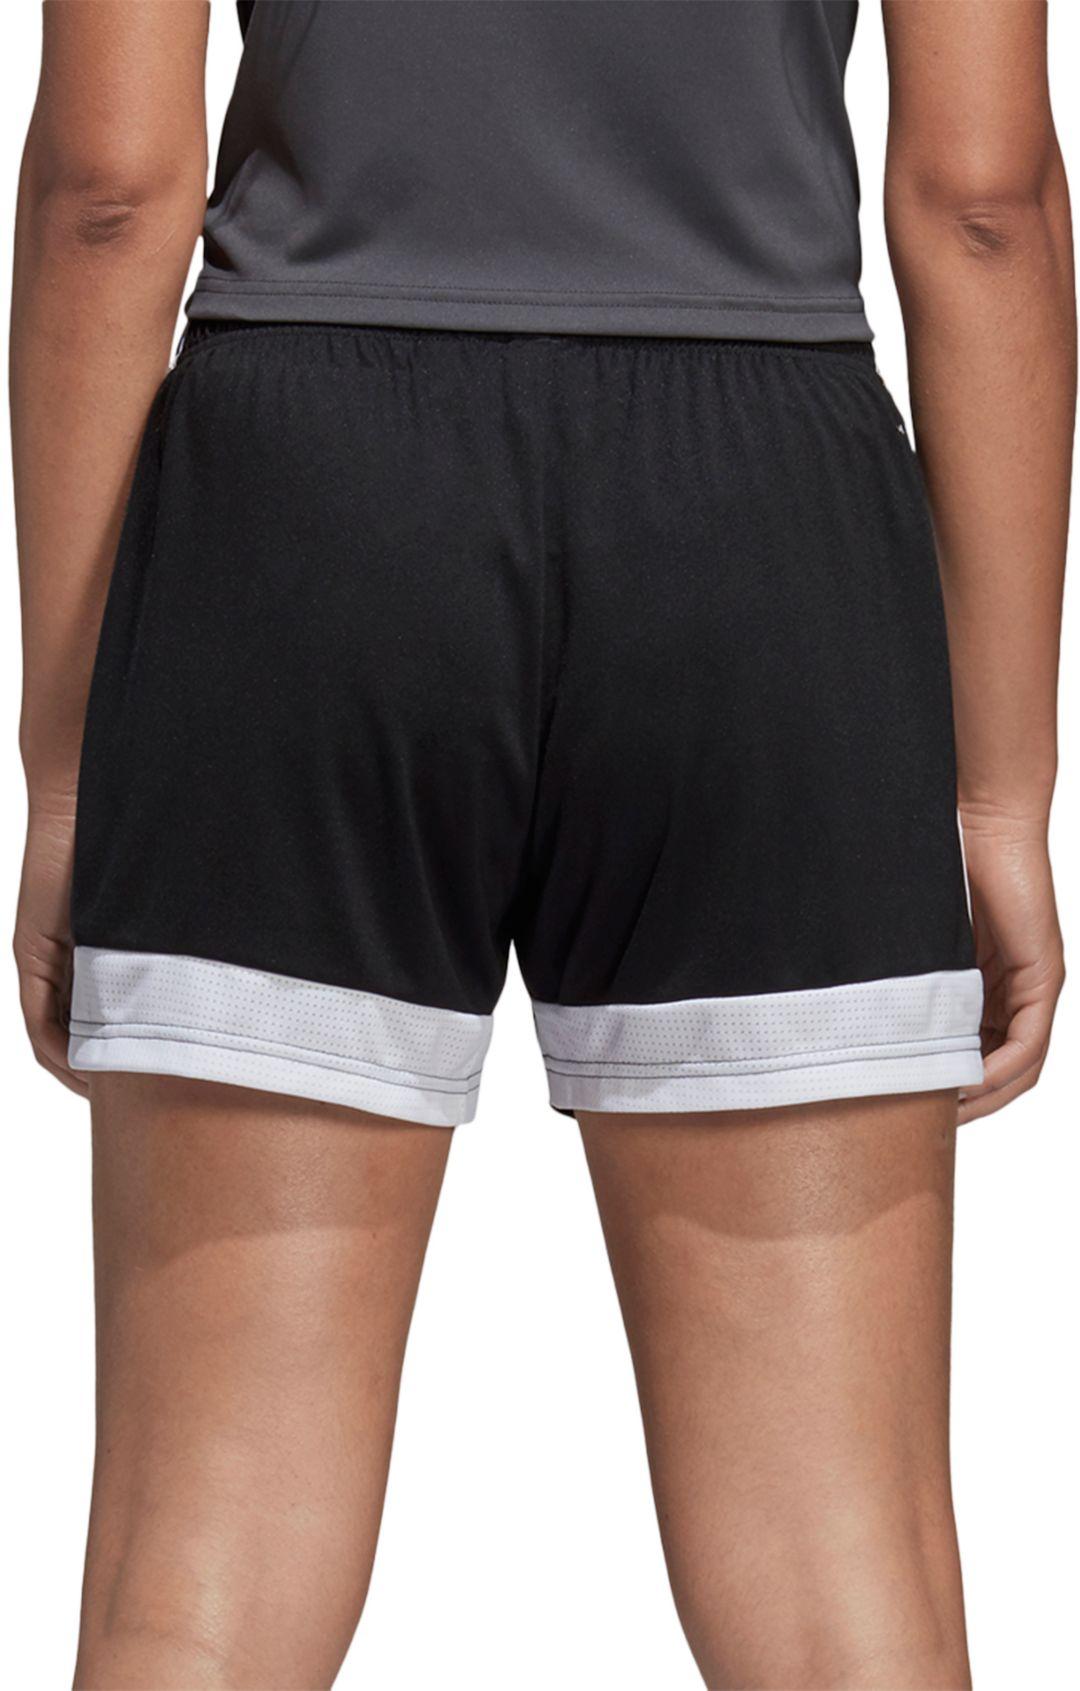 772c18221 adidas Women's Tastigo 19 Soccer Shorts | DICK'S Sporting Goods